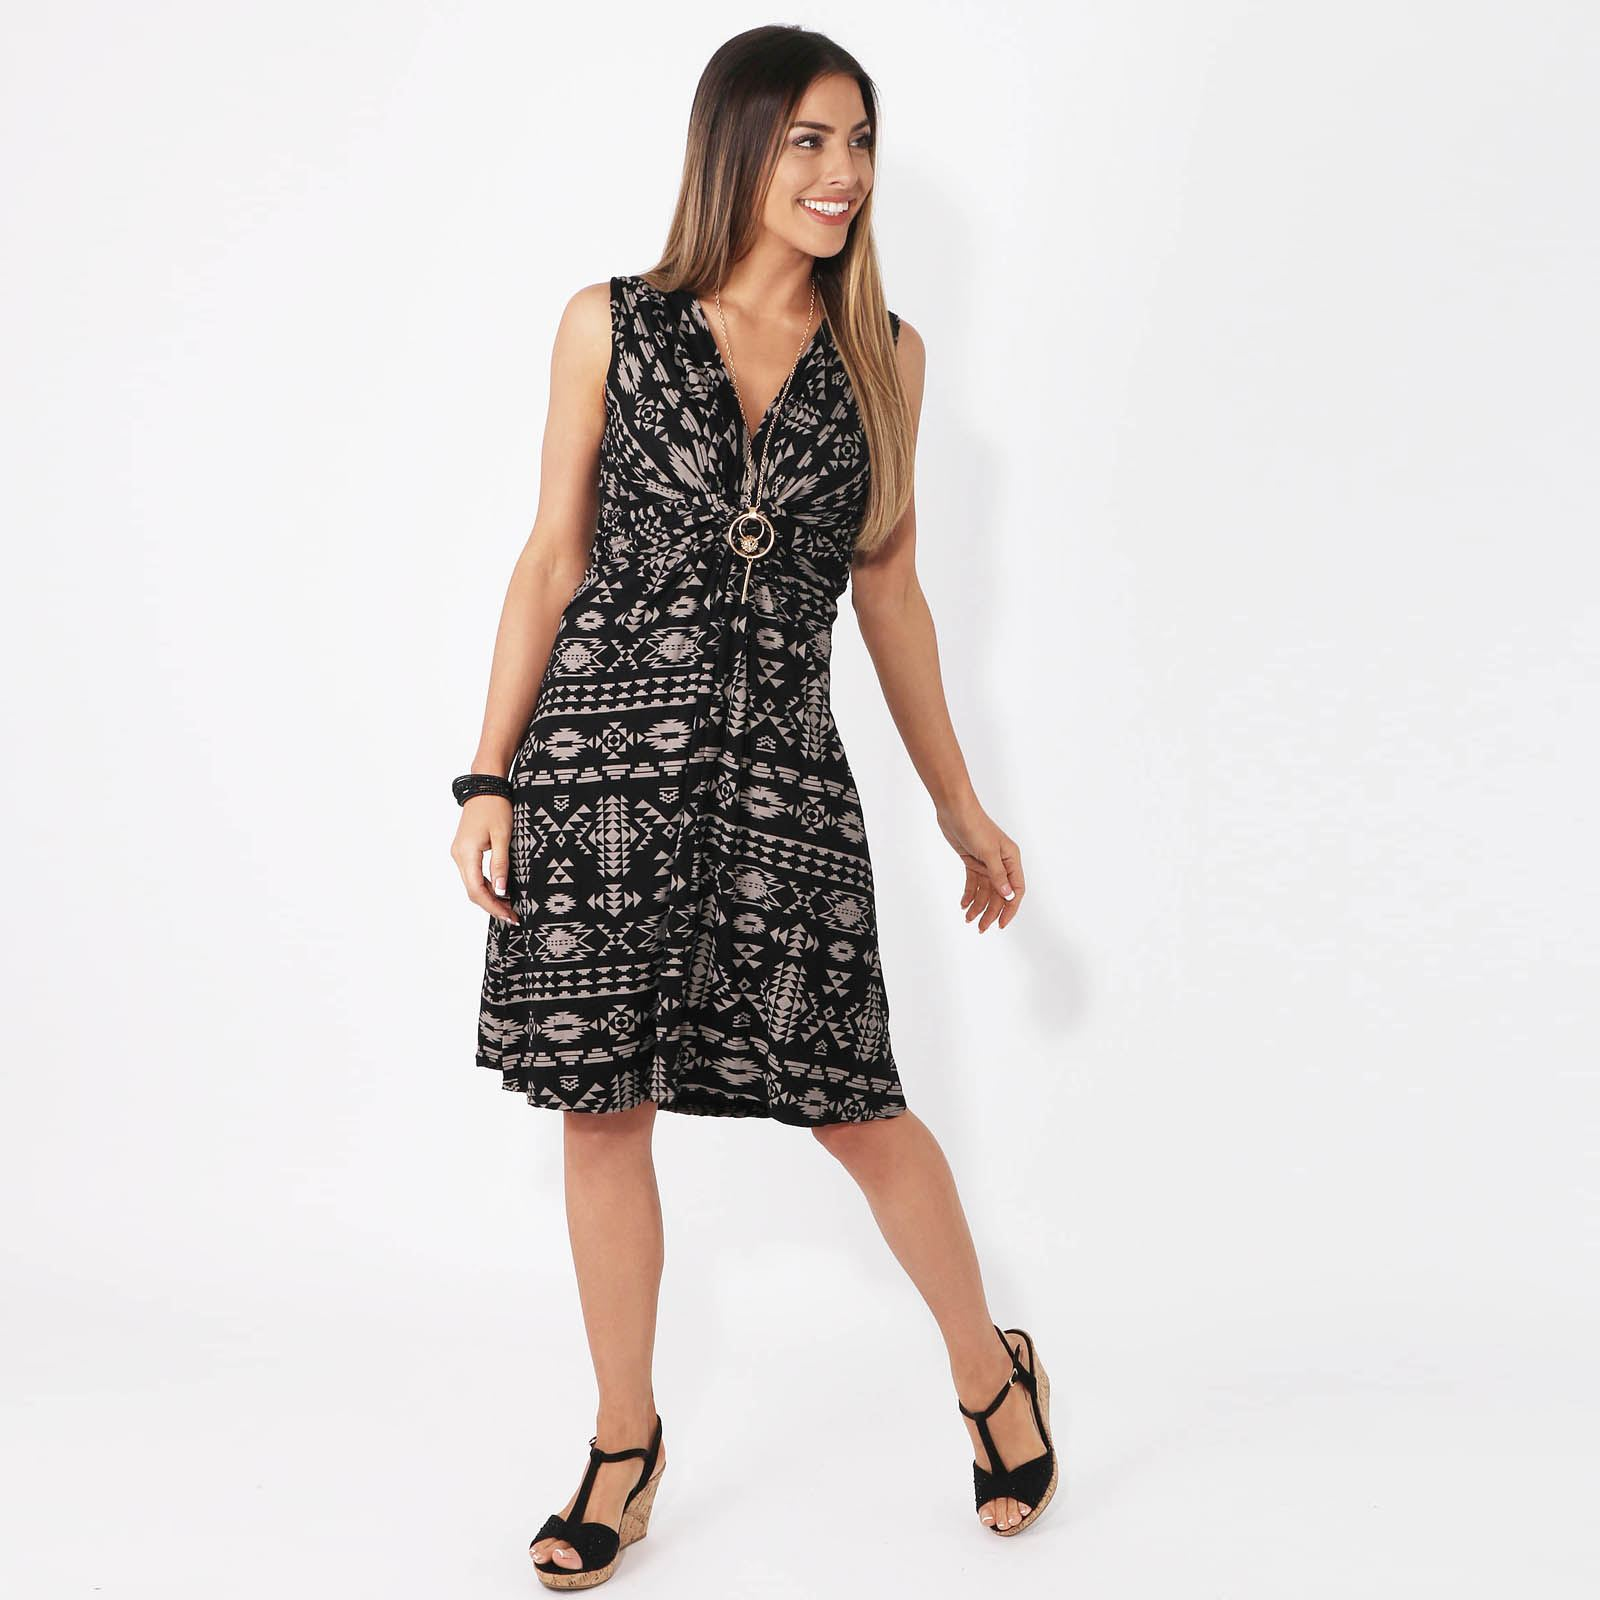 Womens-V-Neck-Mini-Dress-Small-Sizes-Short-Skirt-Tribal-Print-Front-Knot-Party thumbnail 9